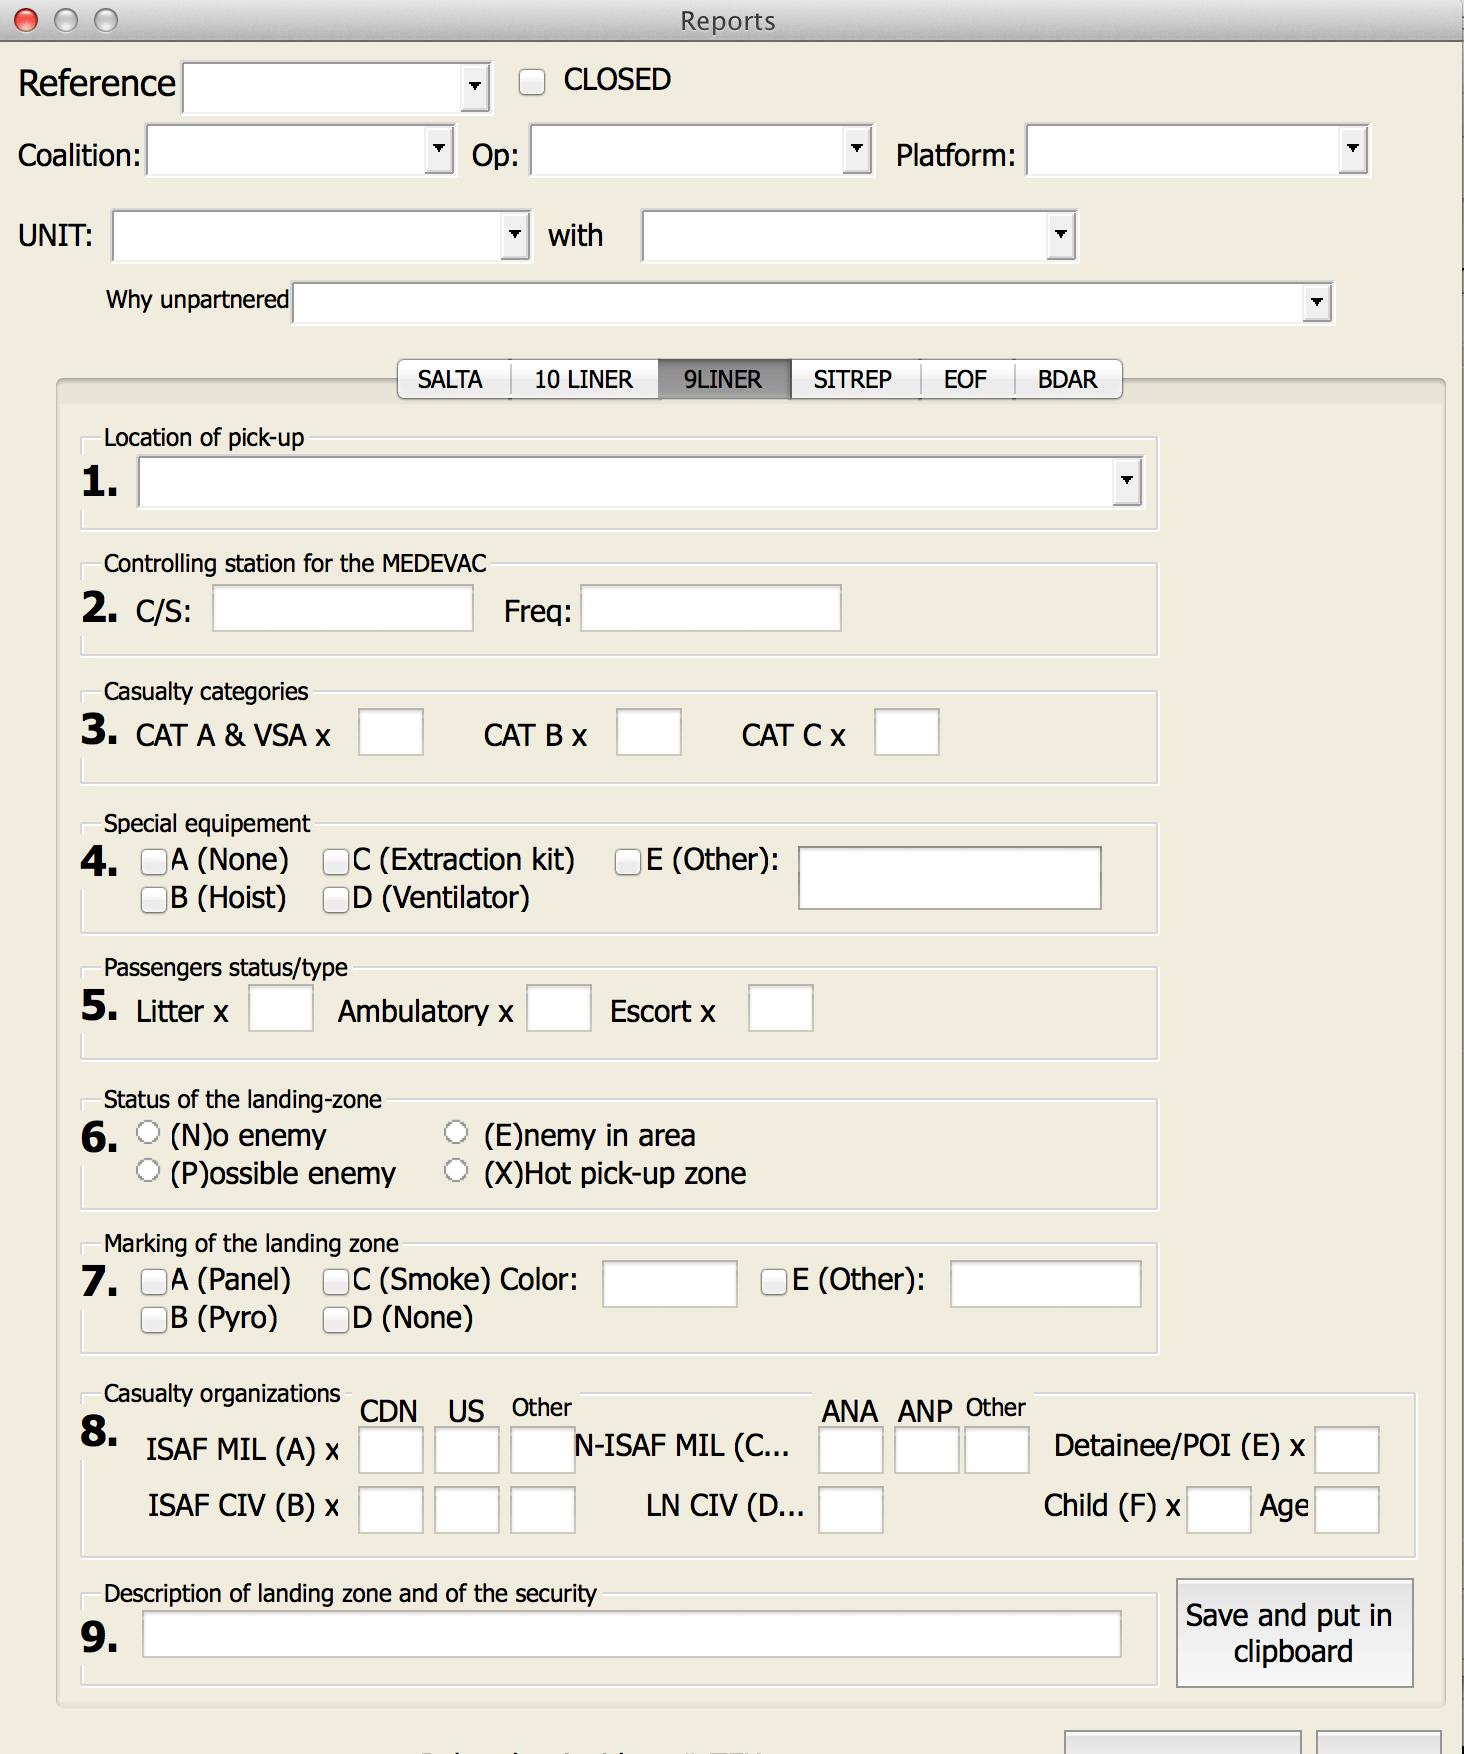 Cat5 Sheetstorm Pro Excel Development Amp Data Wrangling